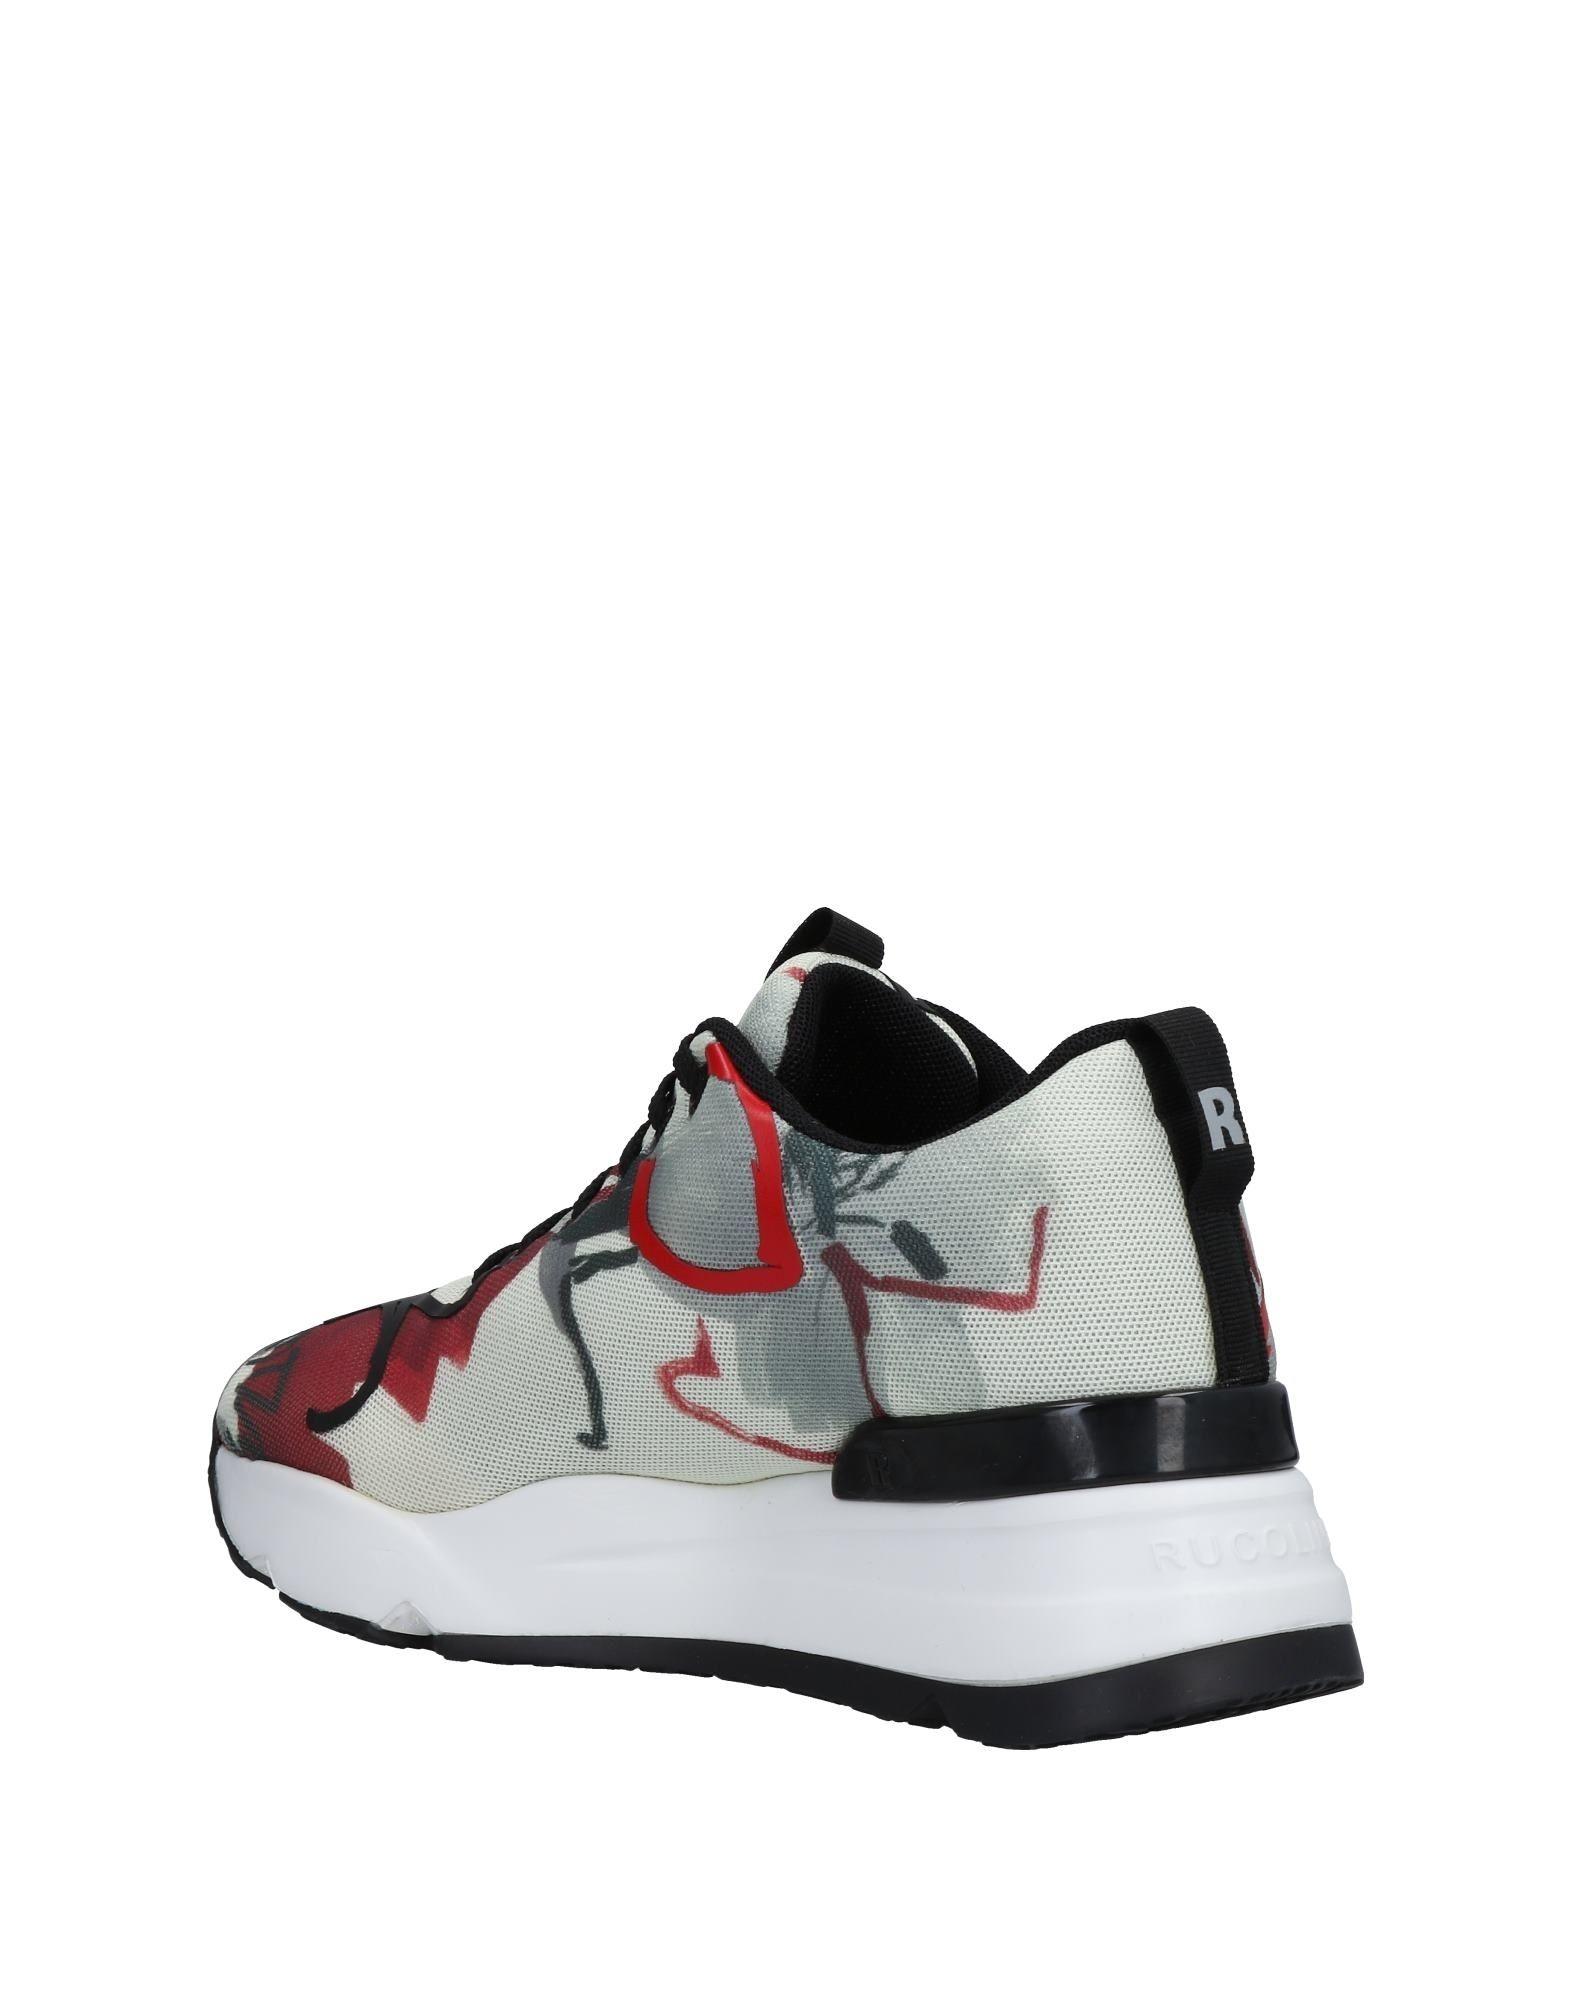 Stilvolle Line billige Schuhe Ruco Line Stilvolle Sneakers Damen  11477311LC 6aa61b